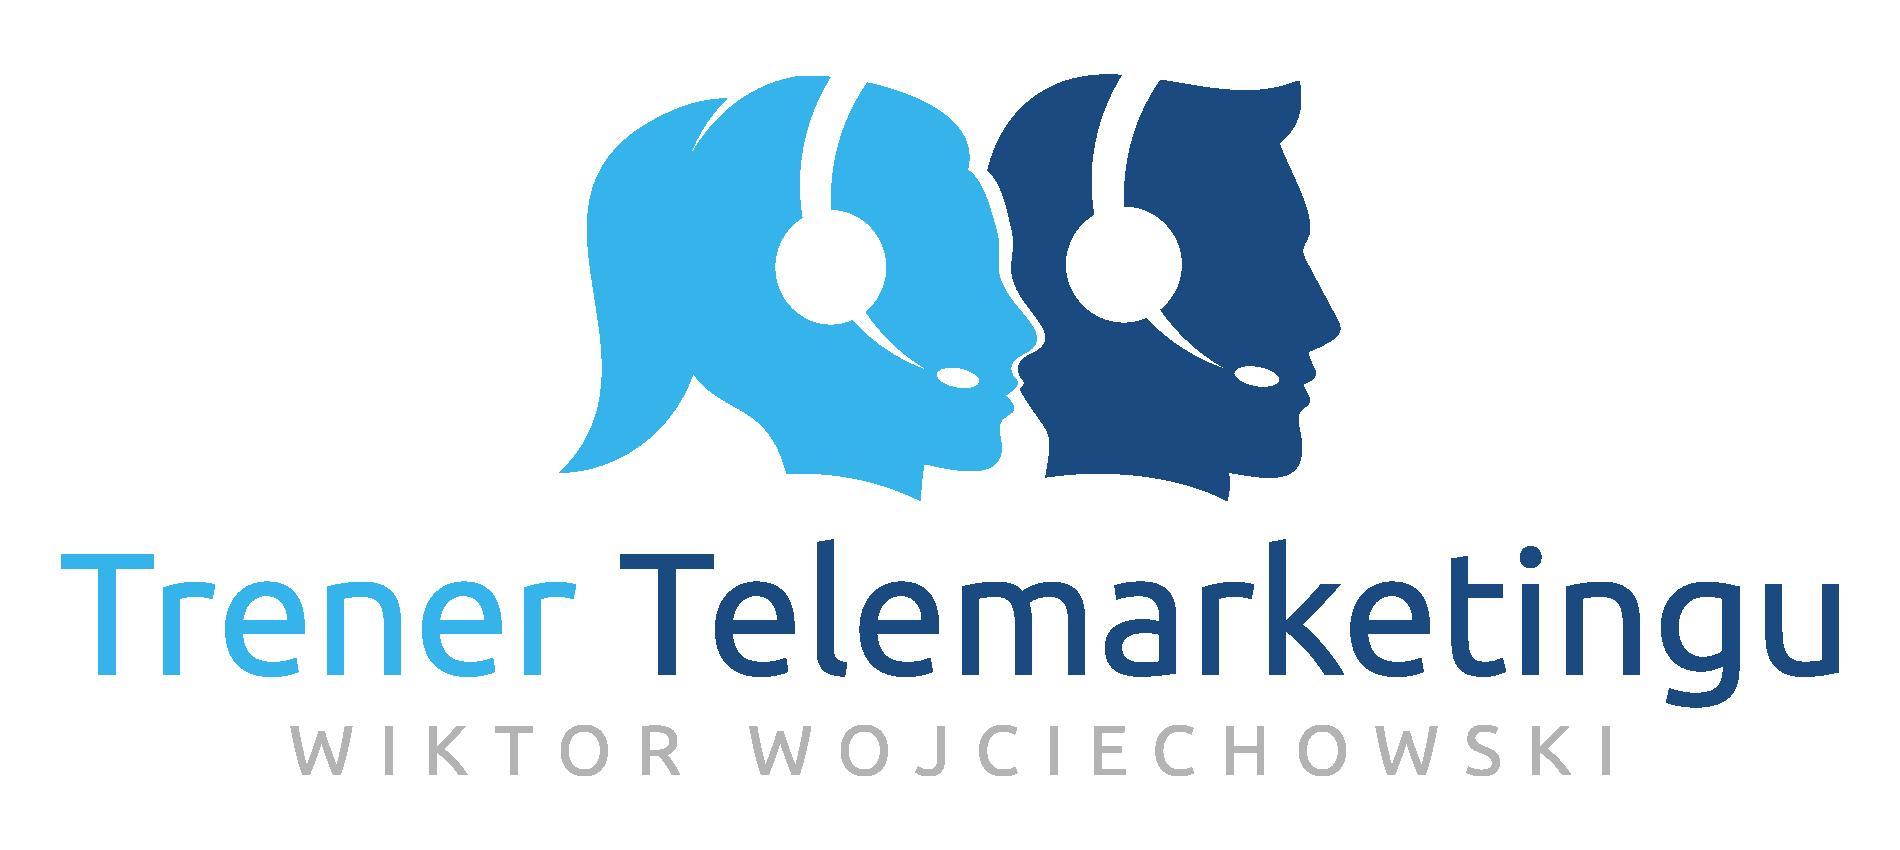 Wiktor Wojciechowski – trener telemarketingu